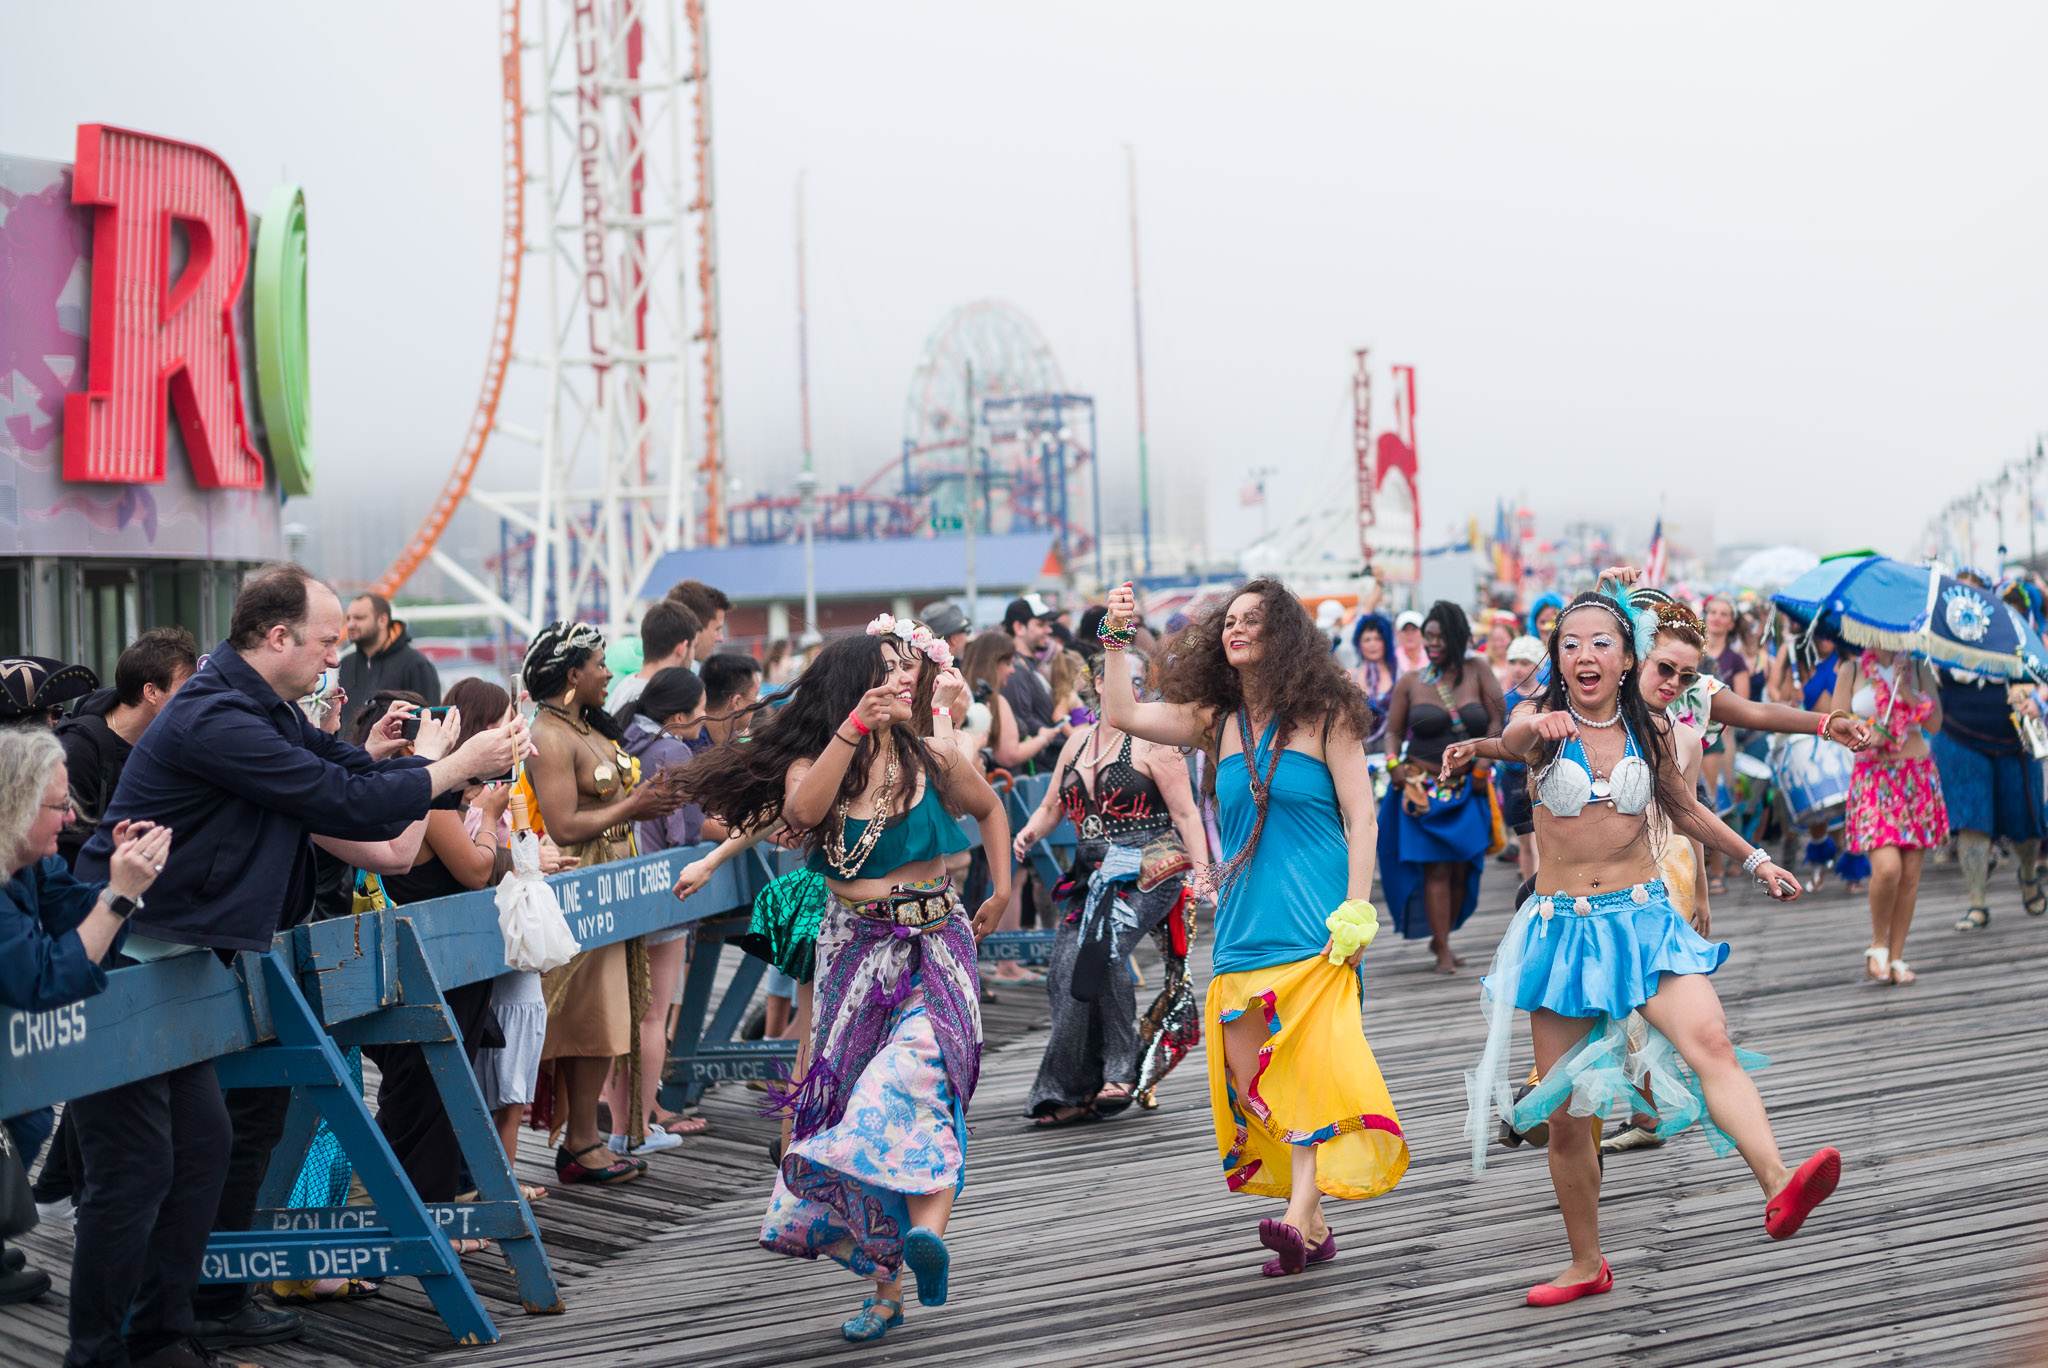 mermaidparade2017_021.jpg